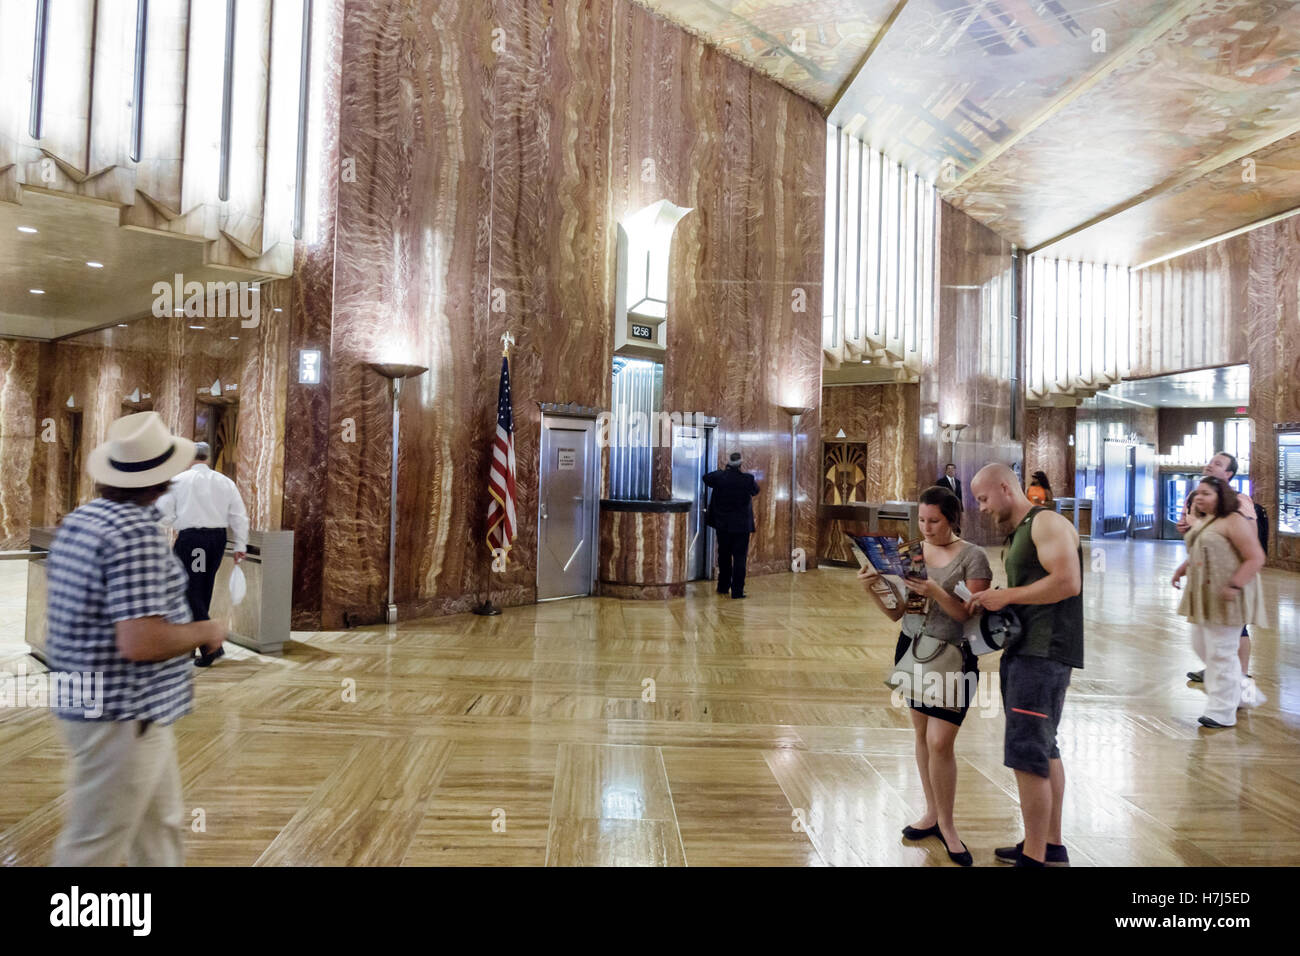 Manhattan New York City NYC NY Midtown 42nd Street Chrysler Building lobby marble Art Deco man woman couple ceiling - Stock Image